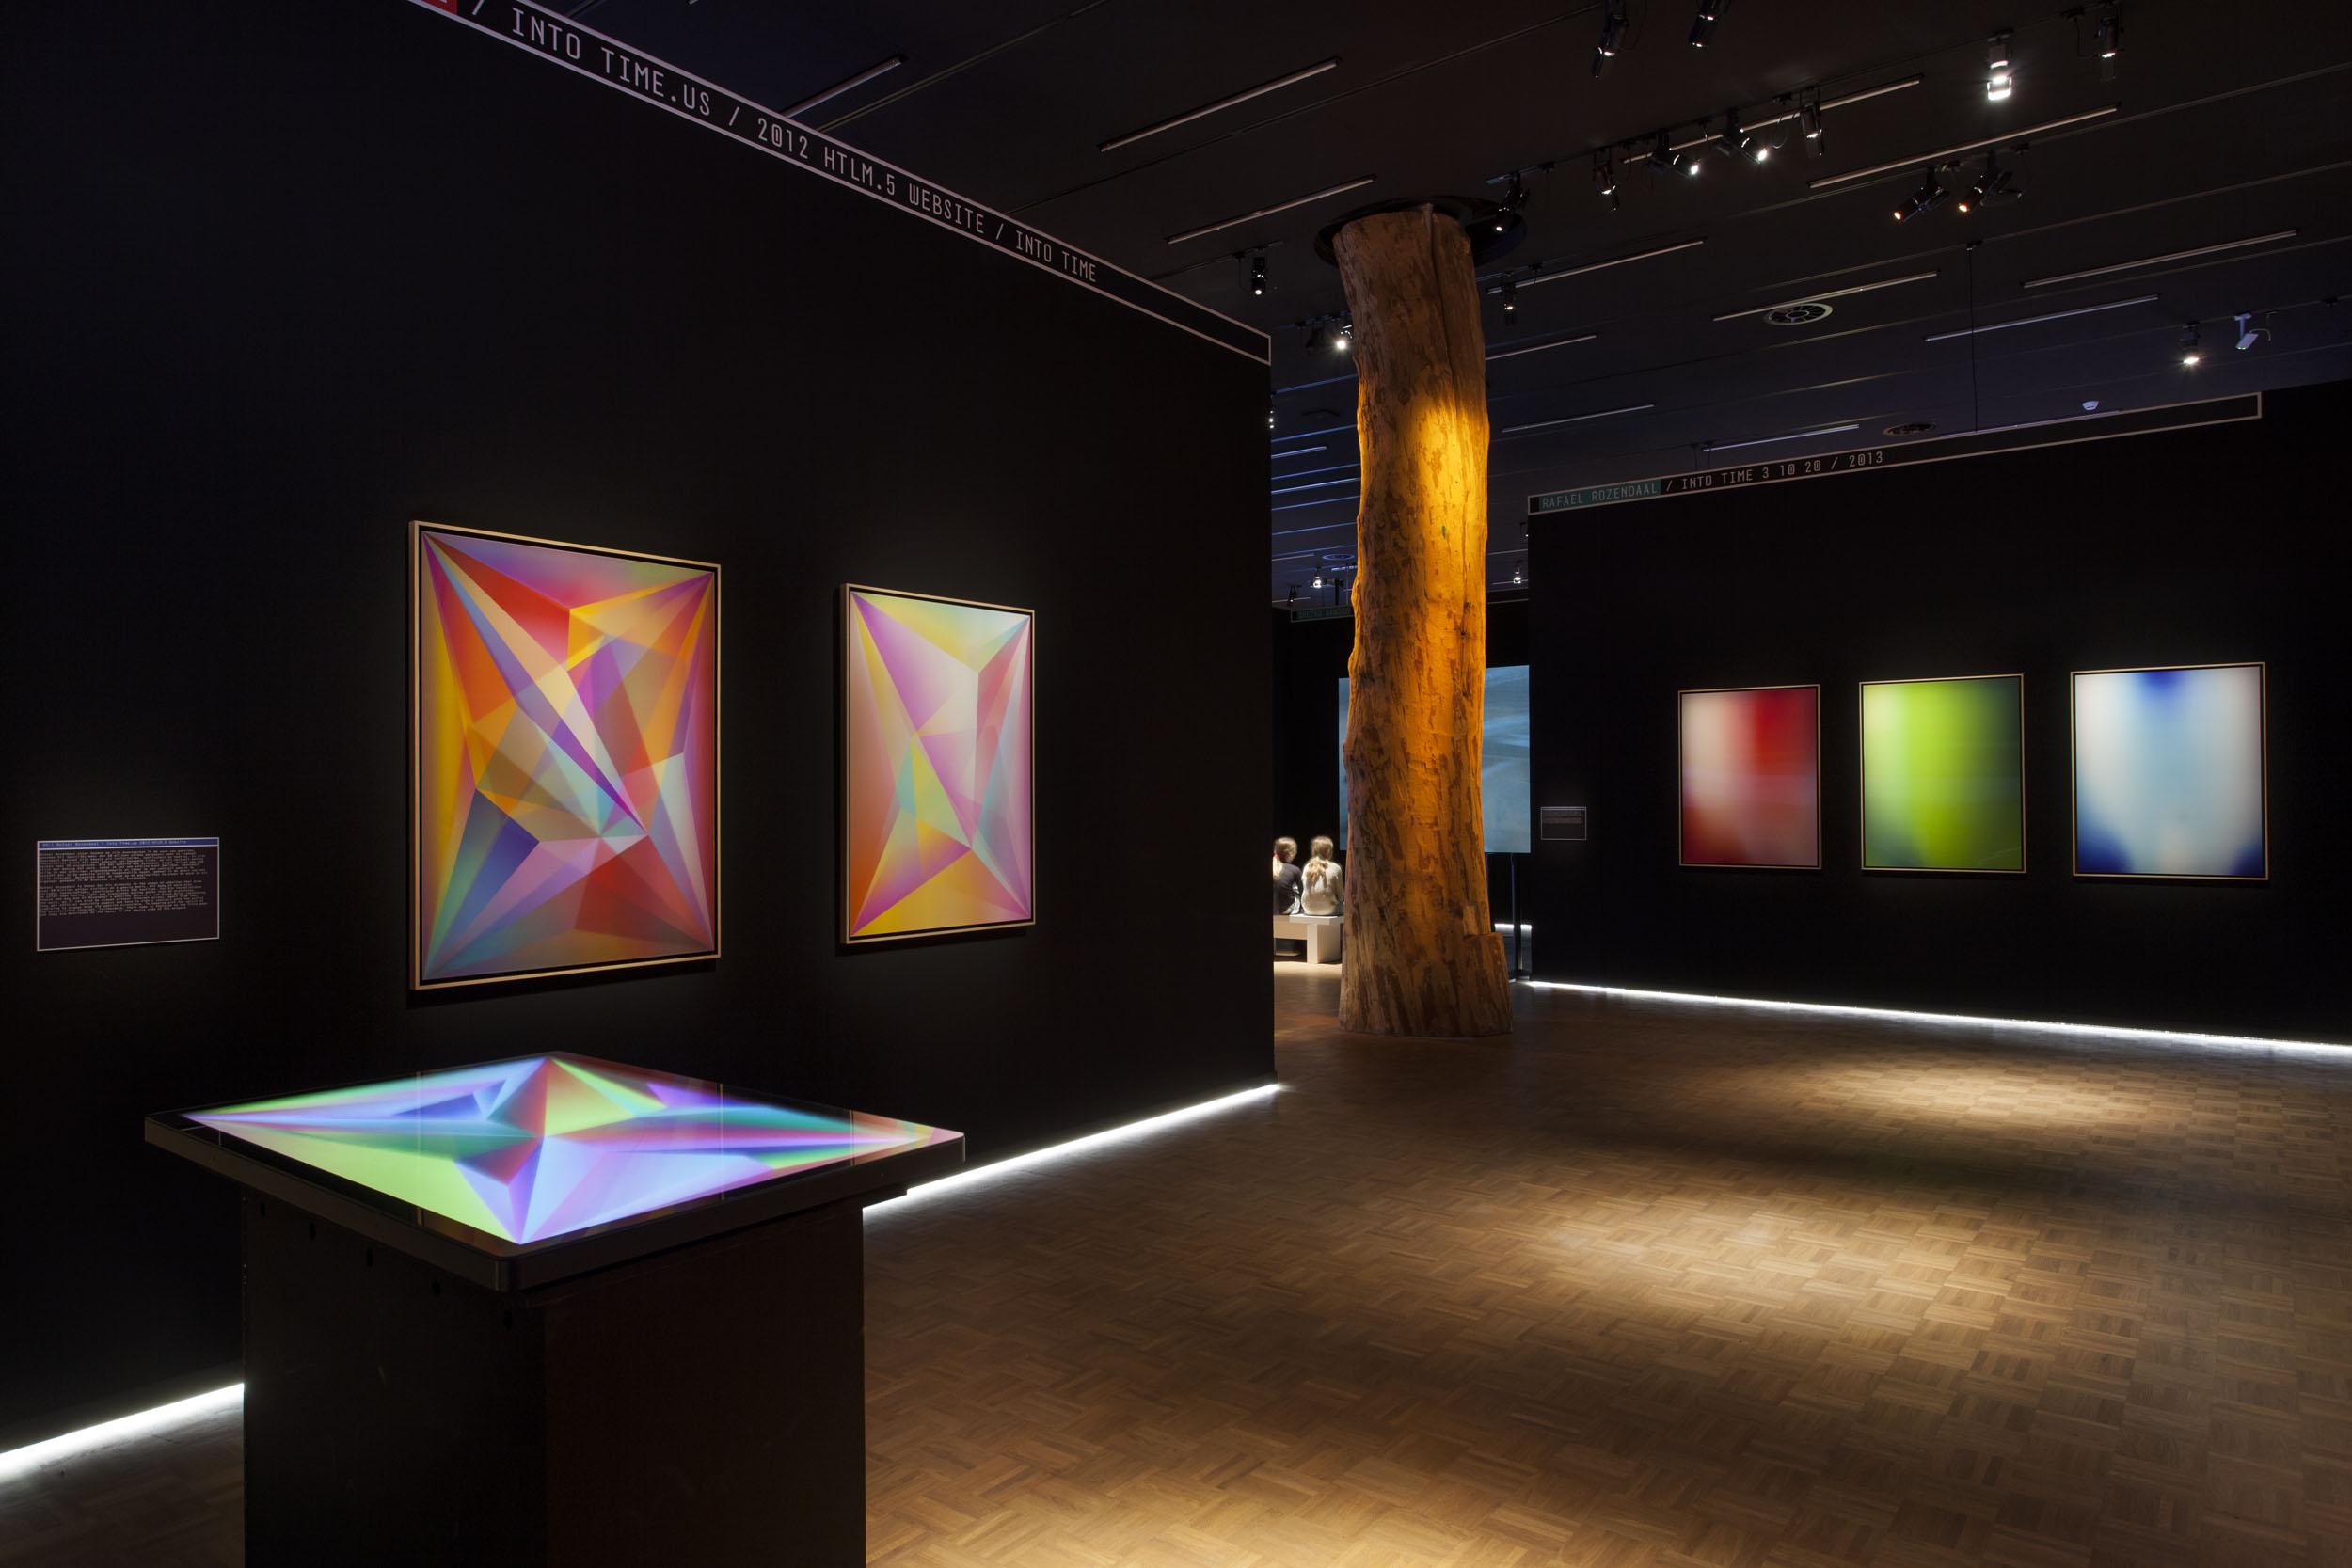 Human - Digital. Exhibition view at Kunsthal Rotterdam, 2017. Photo Job Janssen